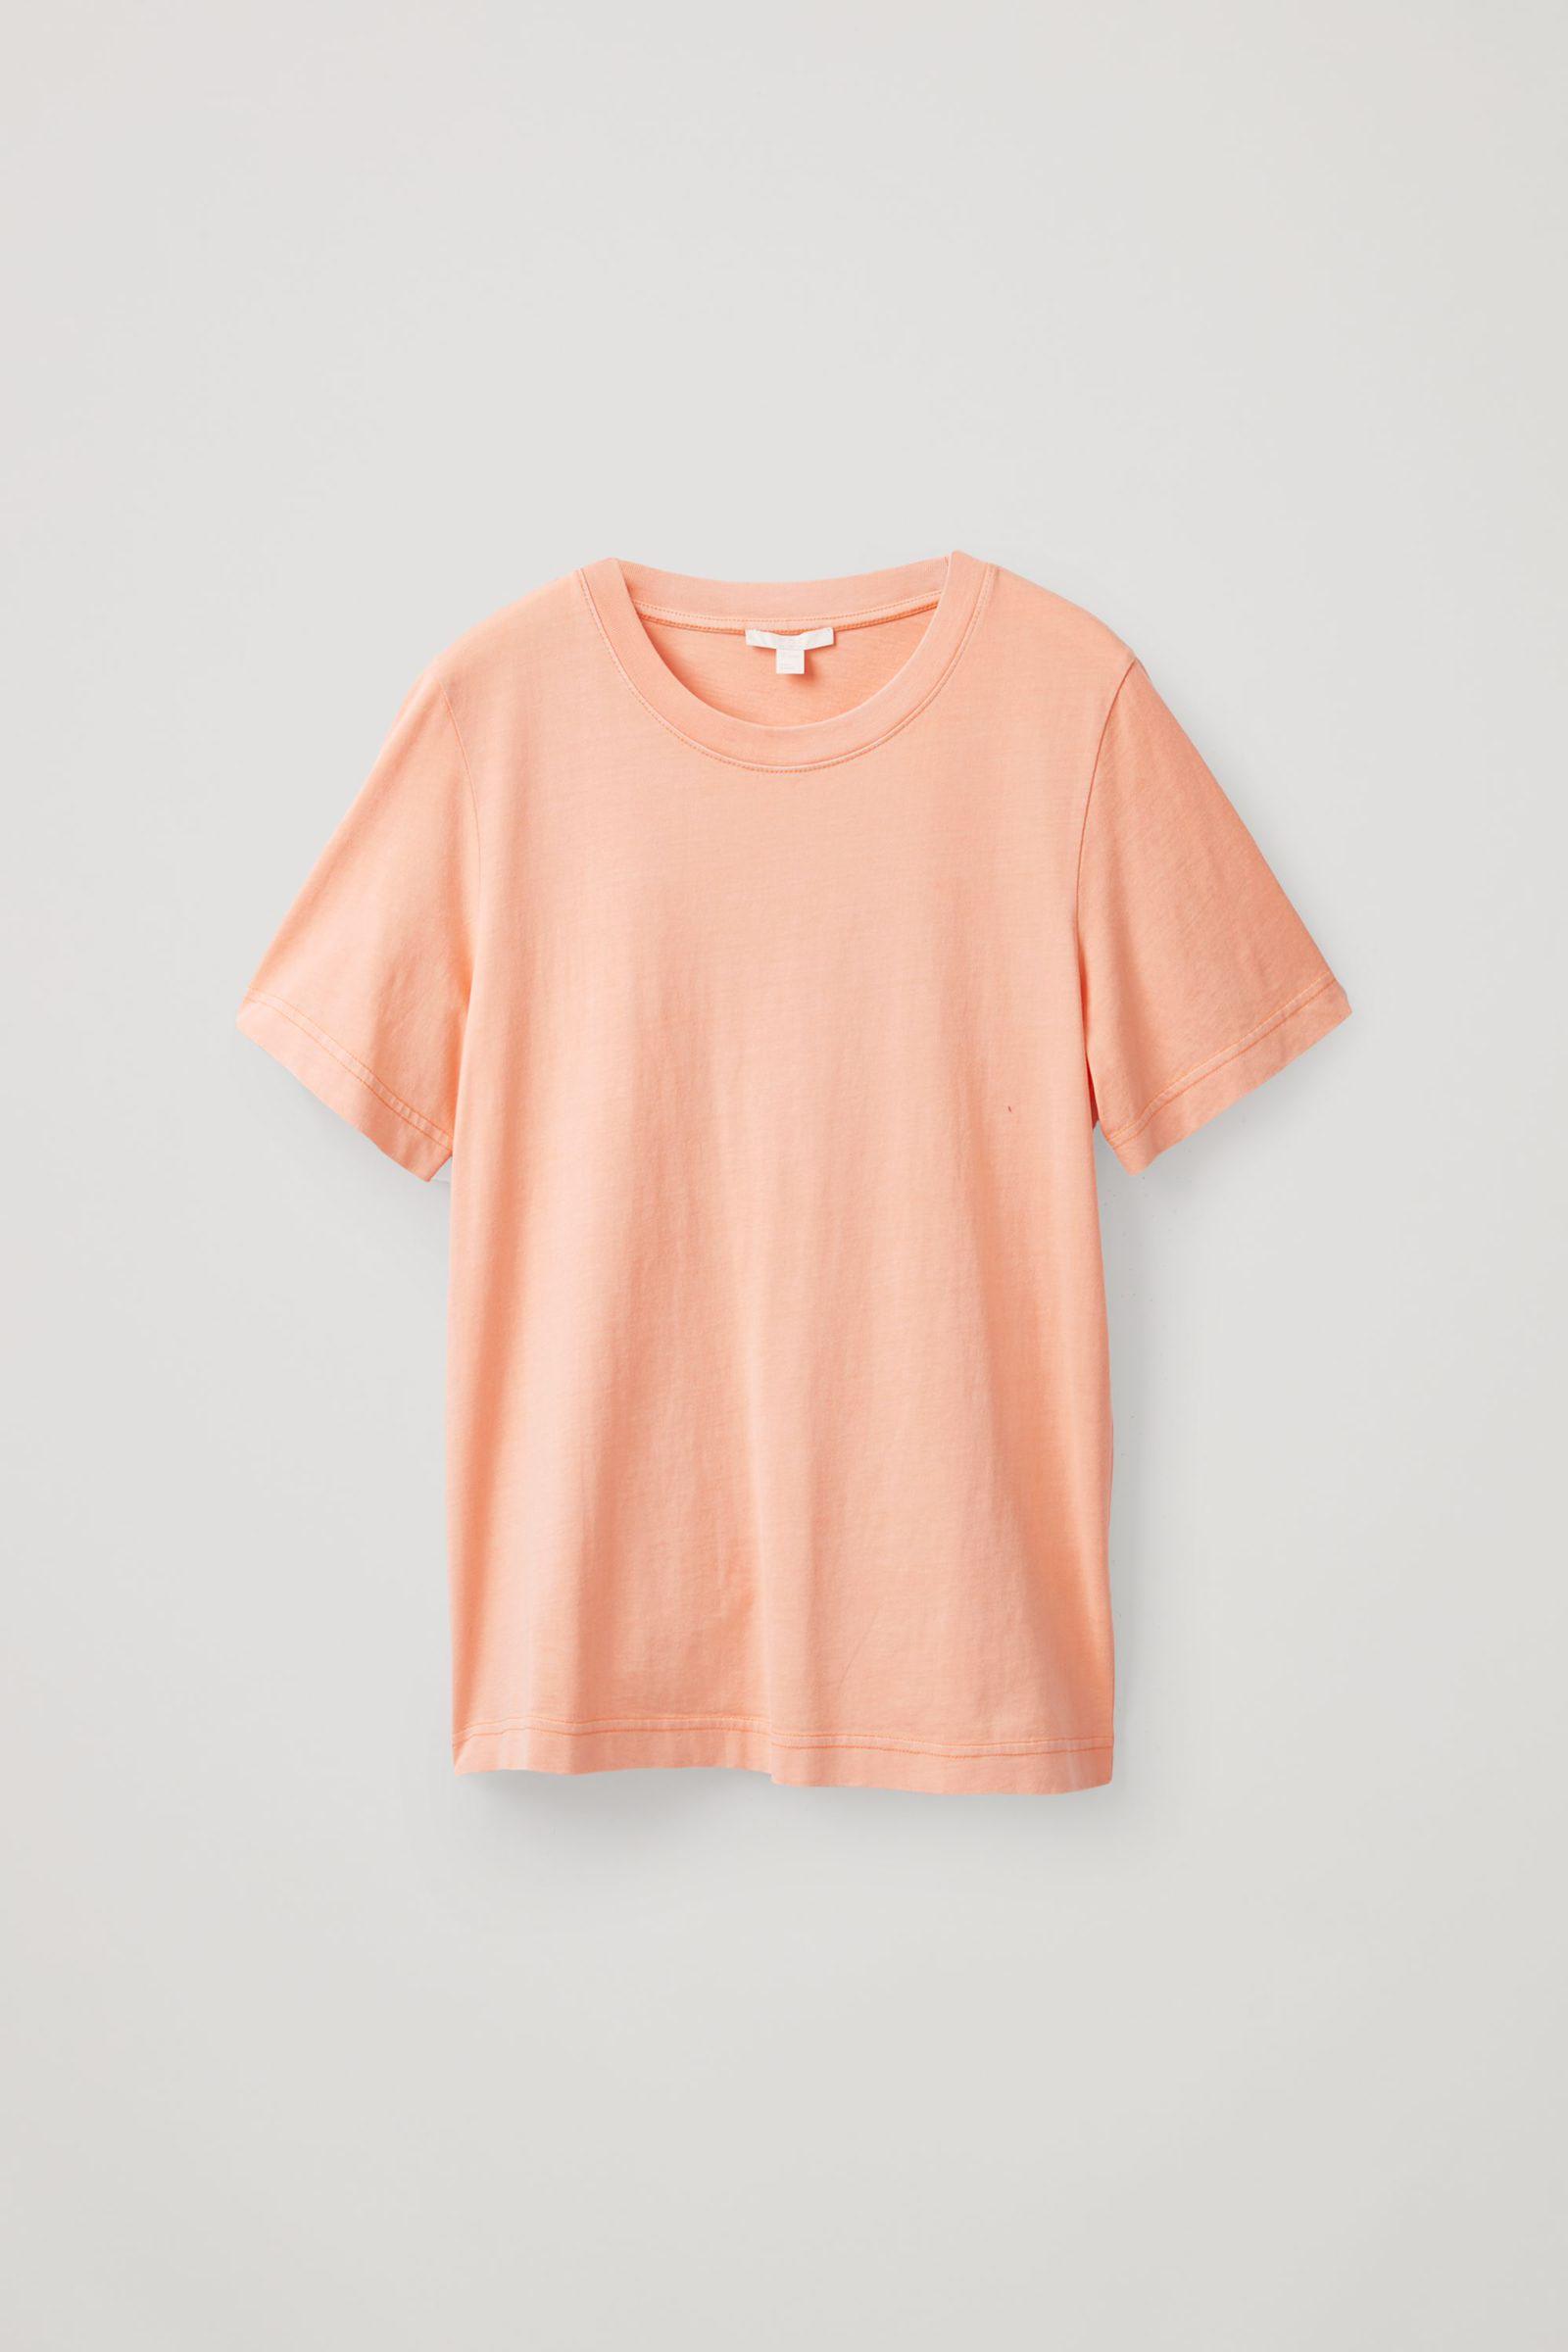 COS 코튼 저지 티셔츠의 핑크컬러 Product입니다.